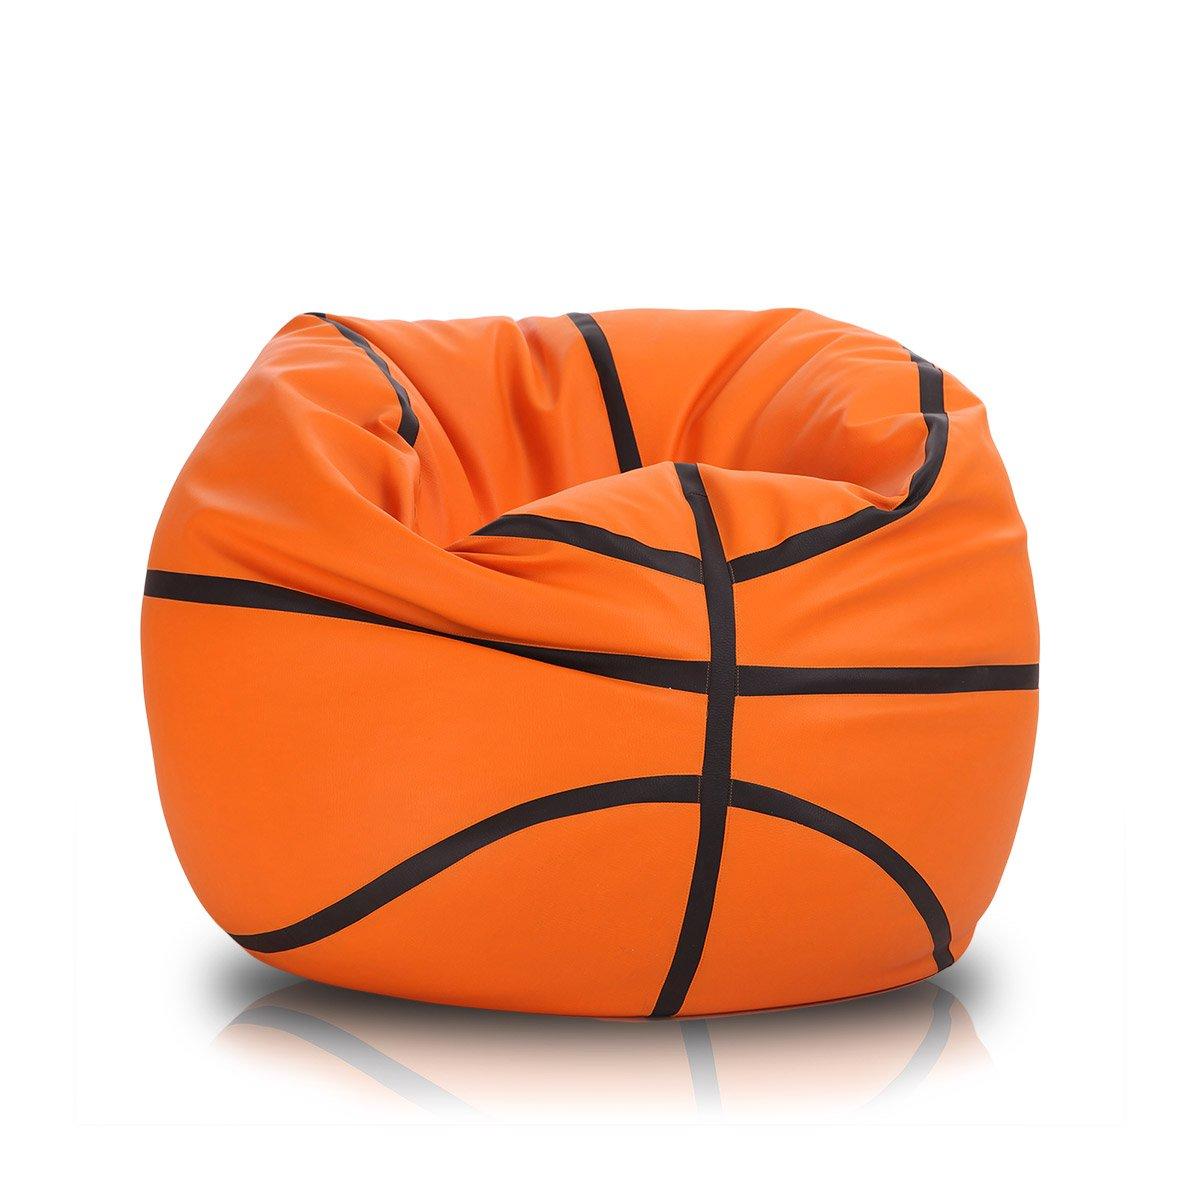 Turbo BeanBags Basketball Style Bean Bag Chair, Large